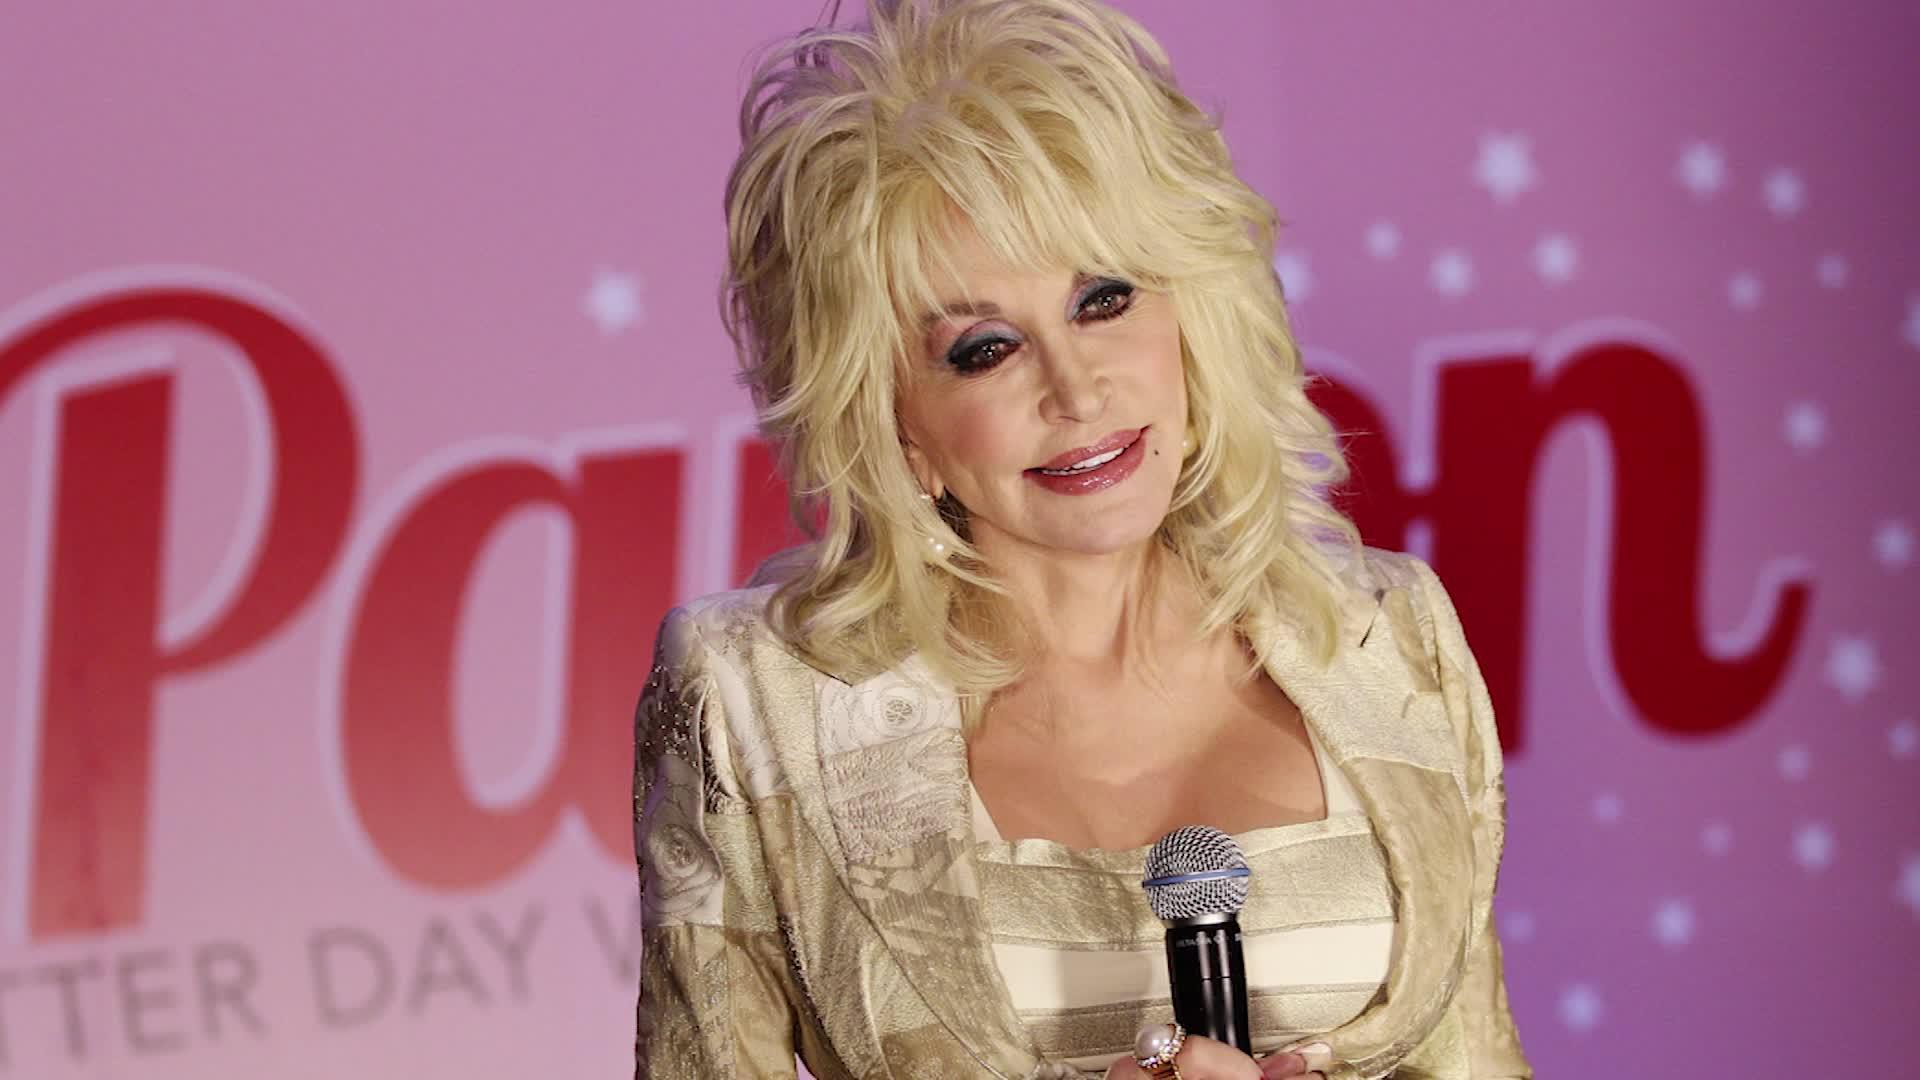 Dolly Parton donates $1 million toward coronavirus research